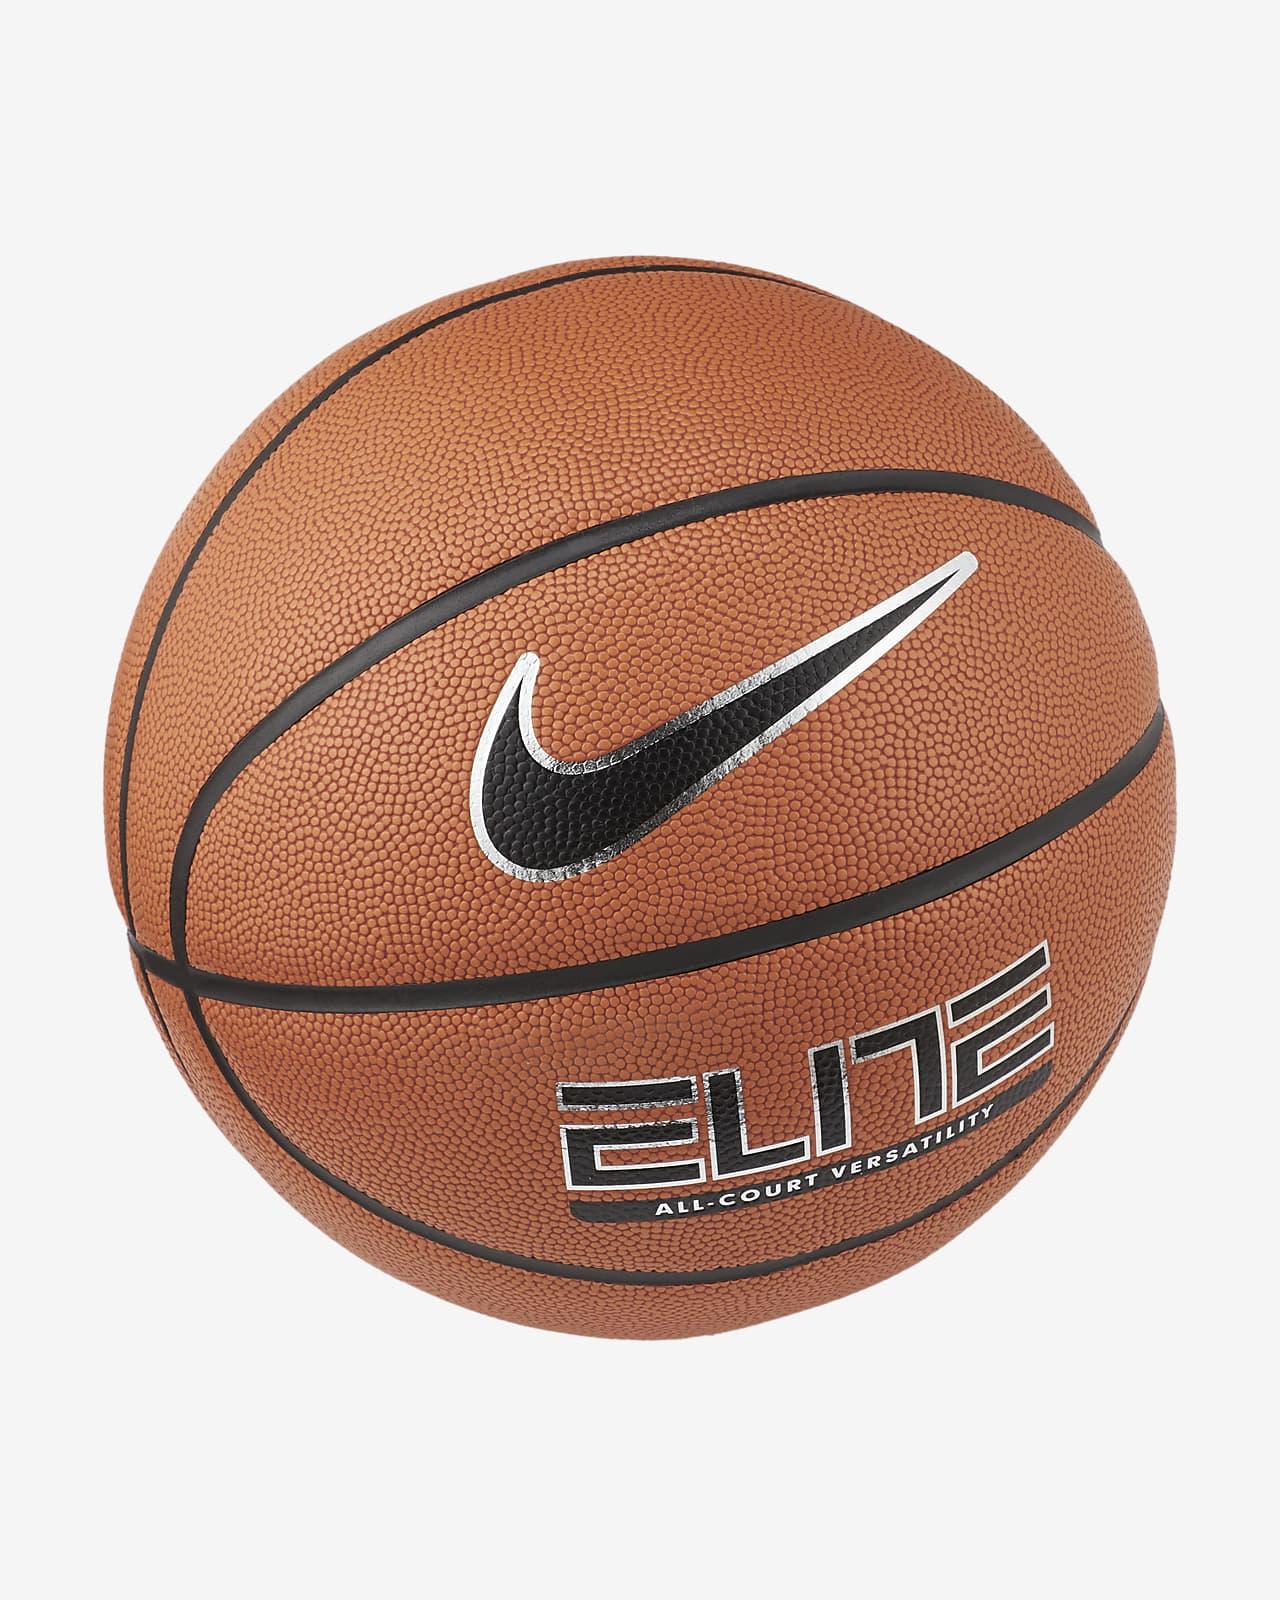 Nike Elite All-Court Basketball